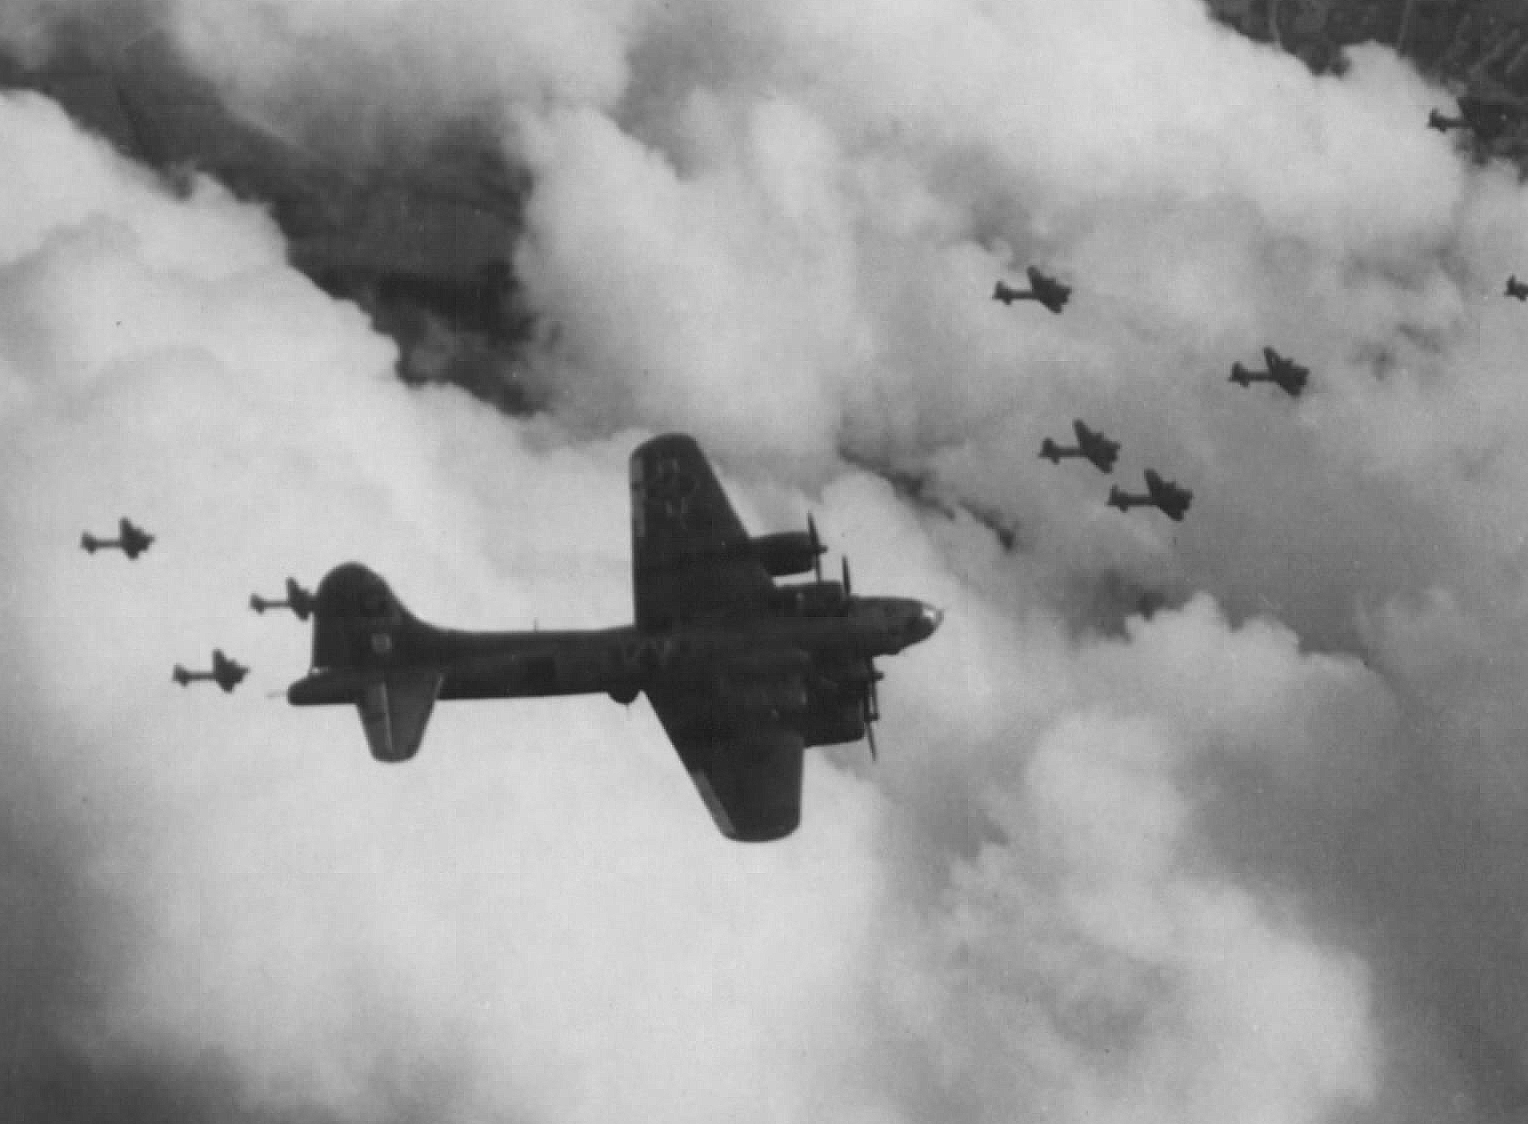 B-17 #42-30678